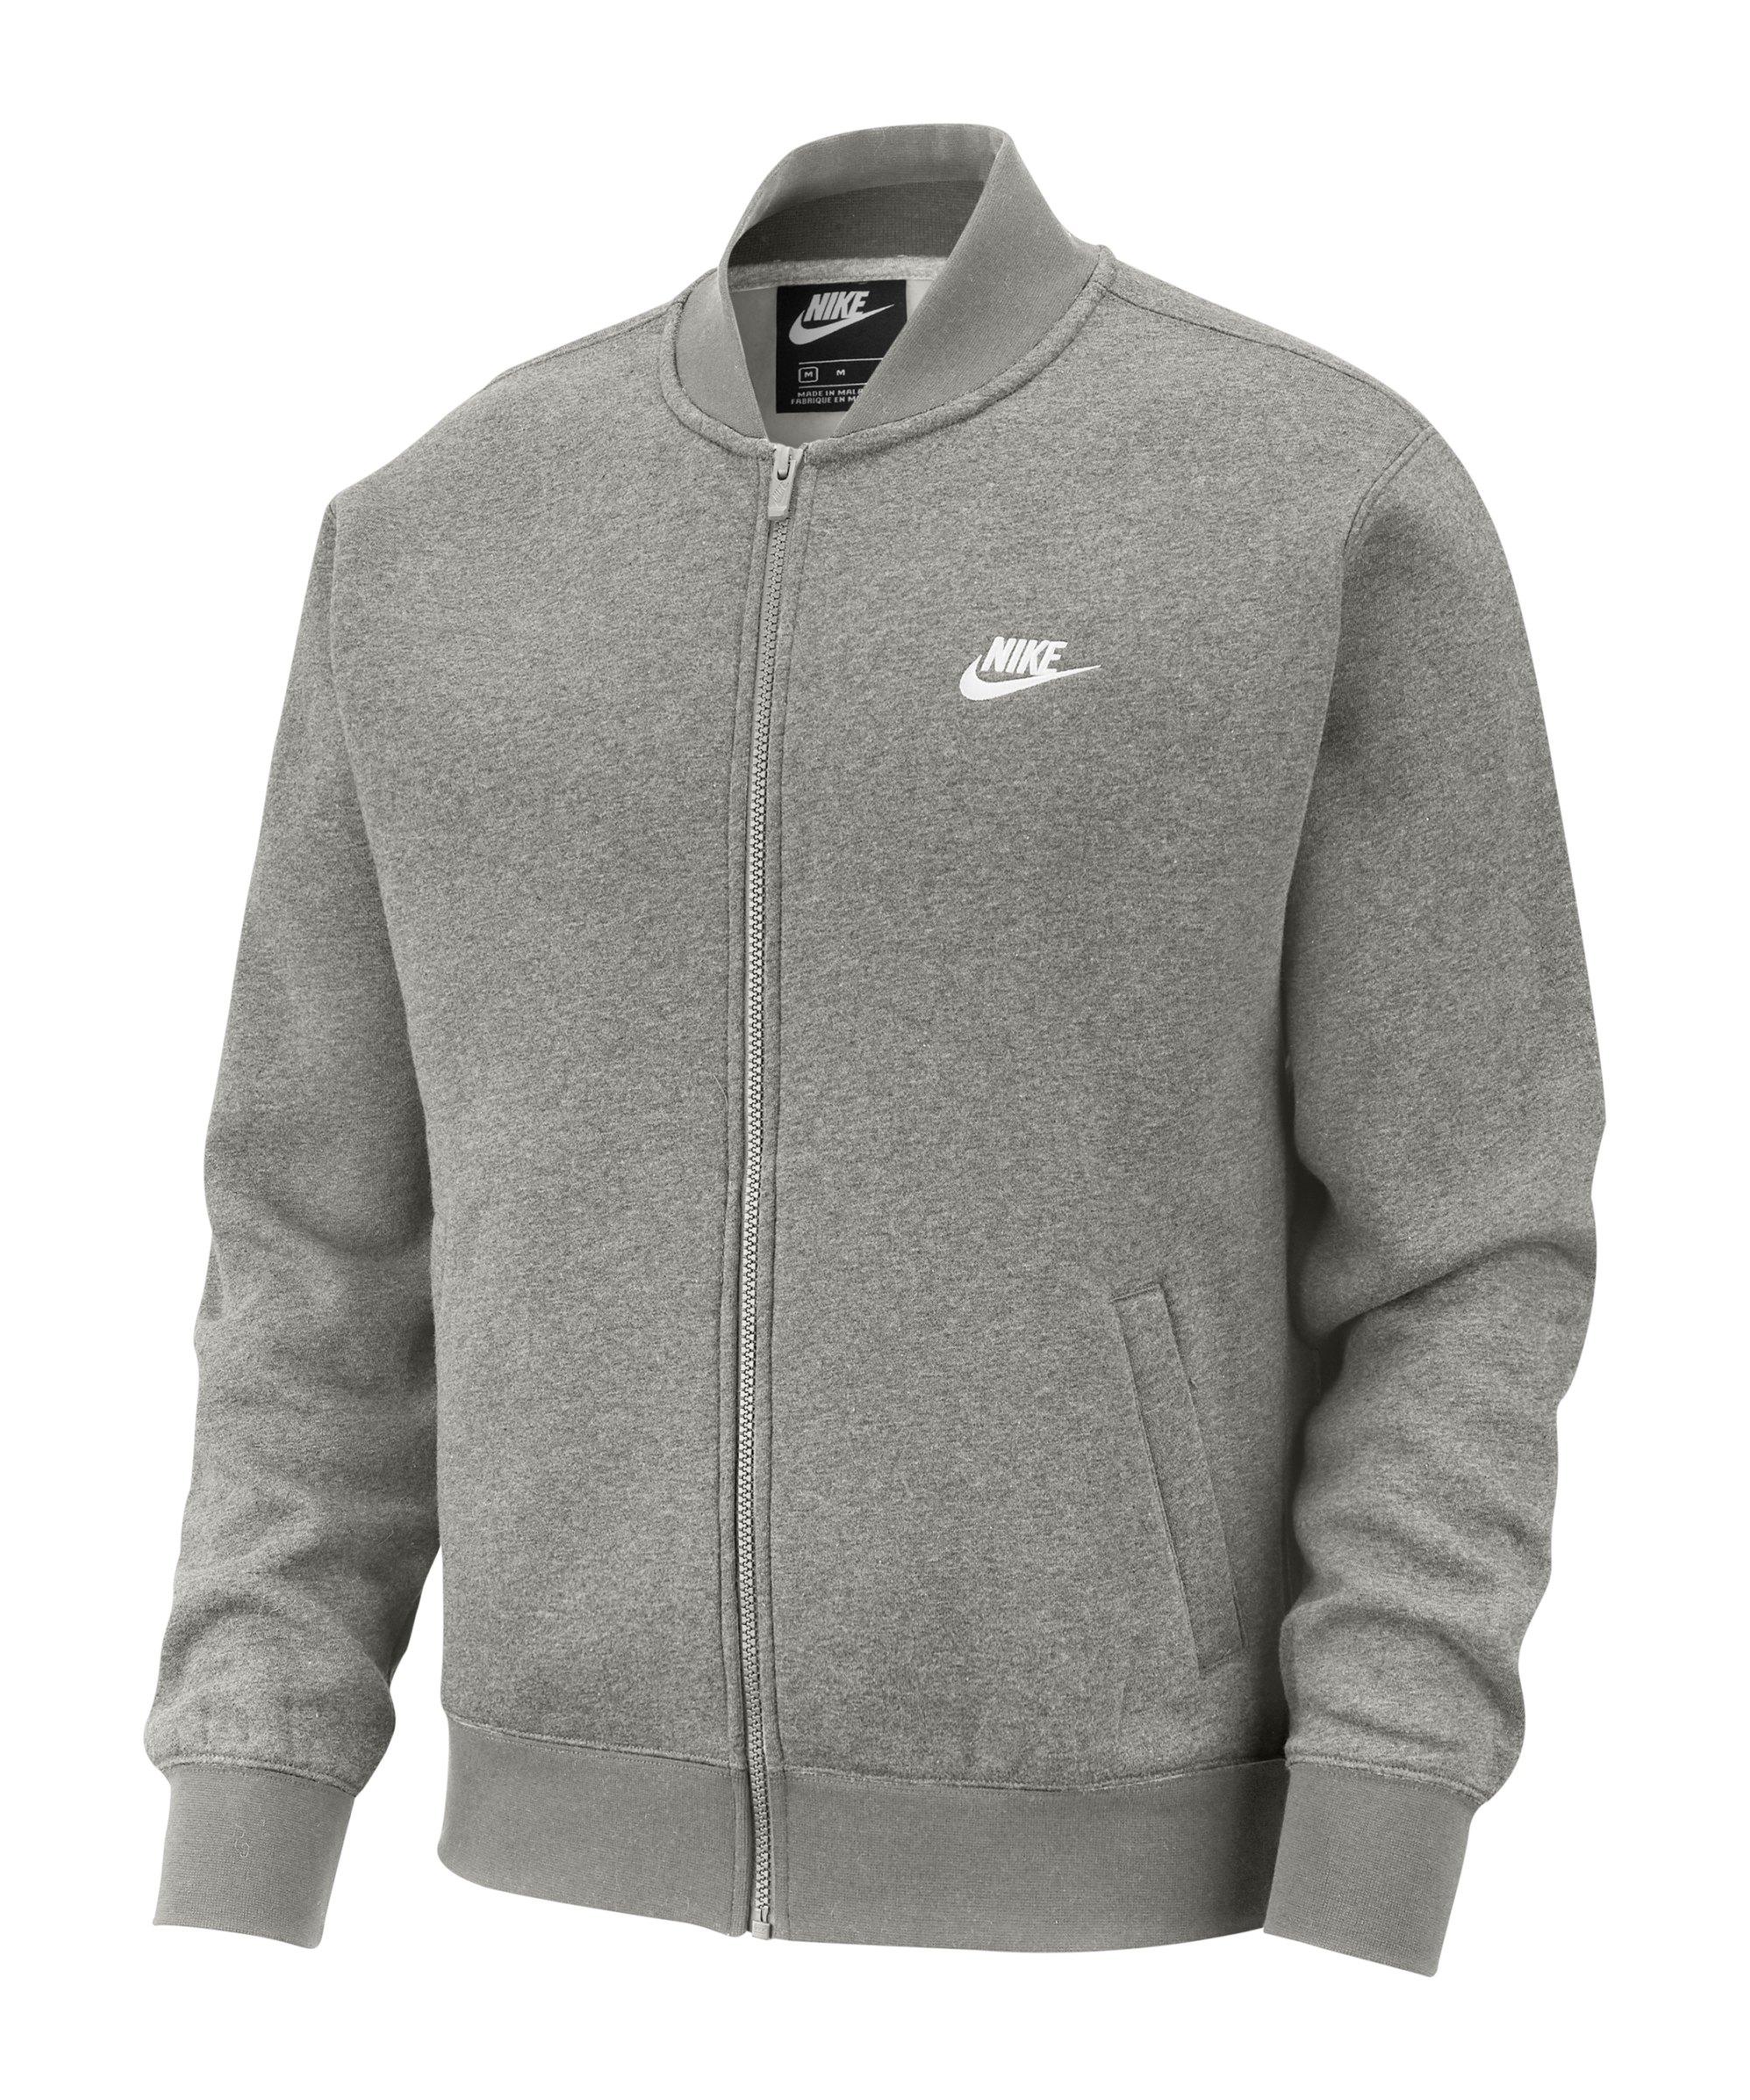 Nike Club Fleece Bomber Jacke Grau Weiss F063 - grau